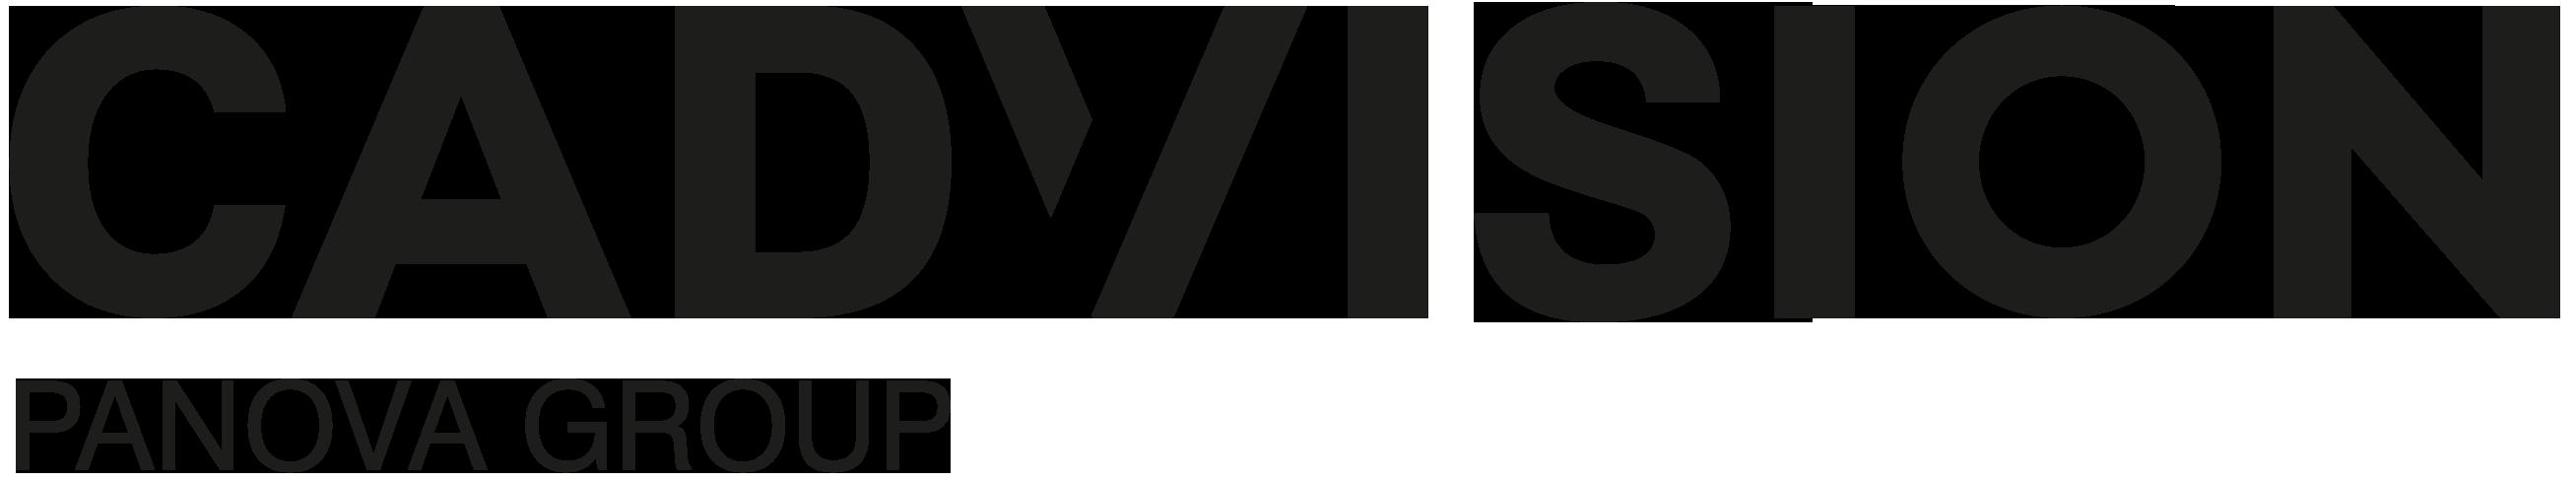 CADVISION _logo